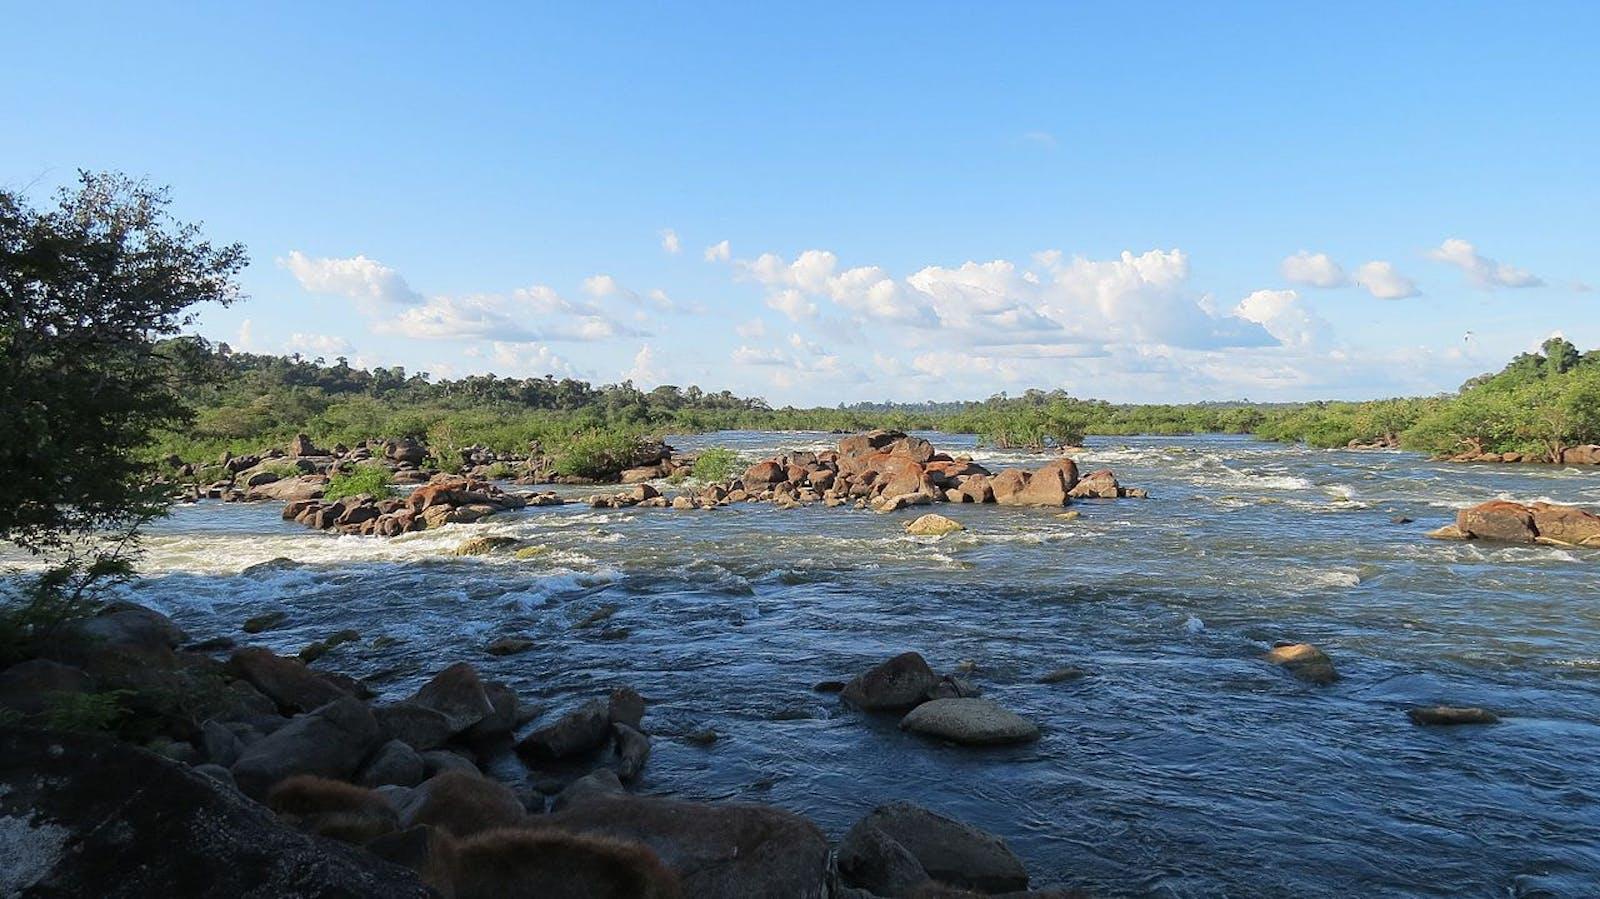 Tapajós-Xingu Moist Forests